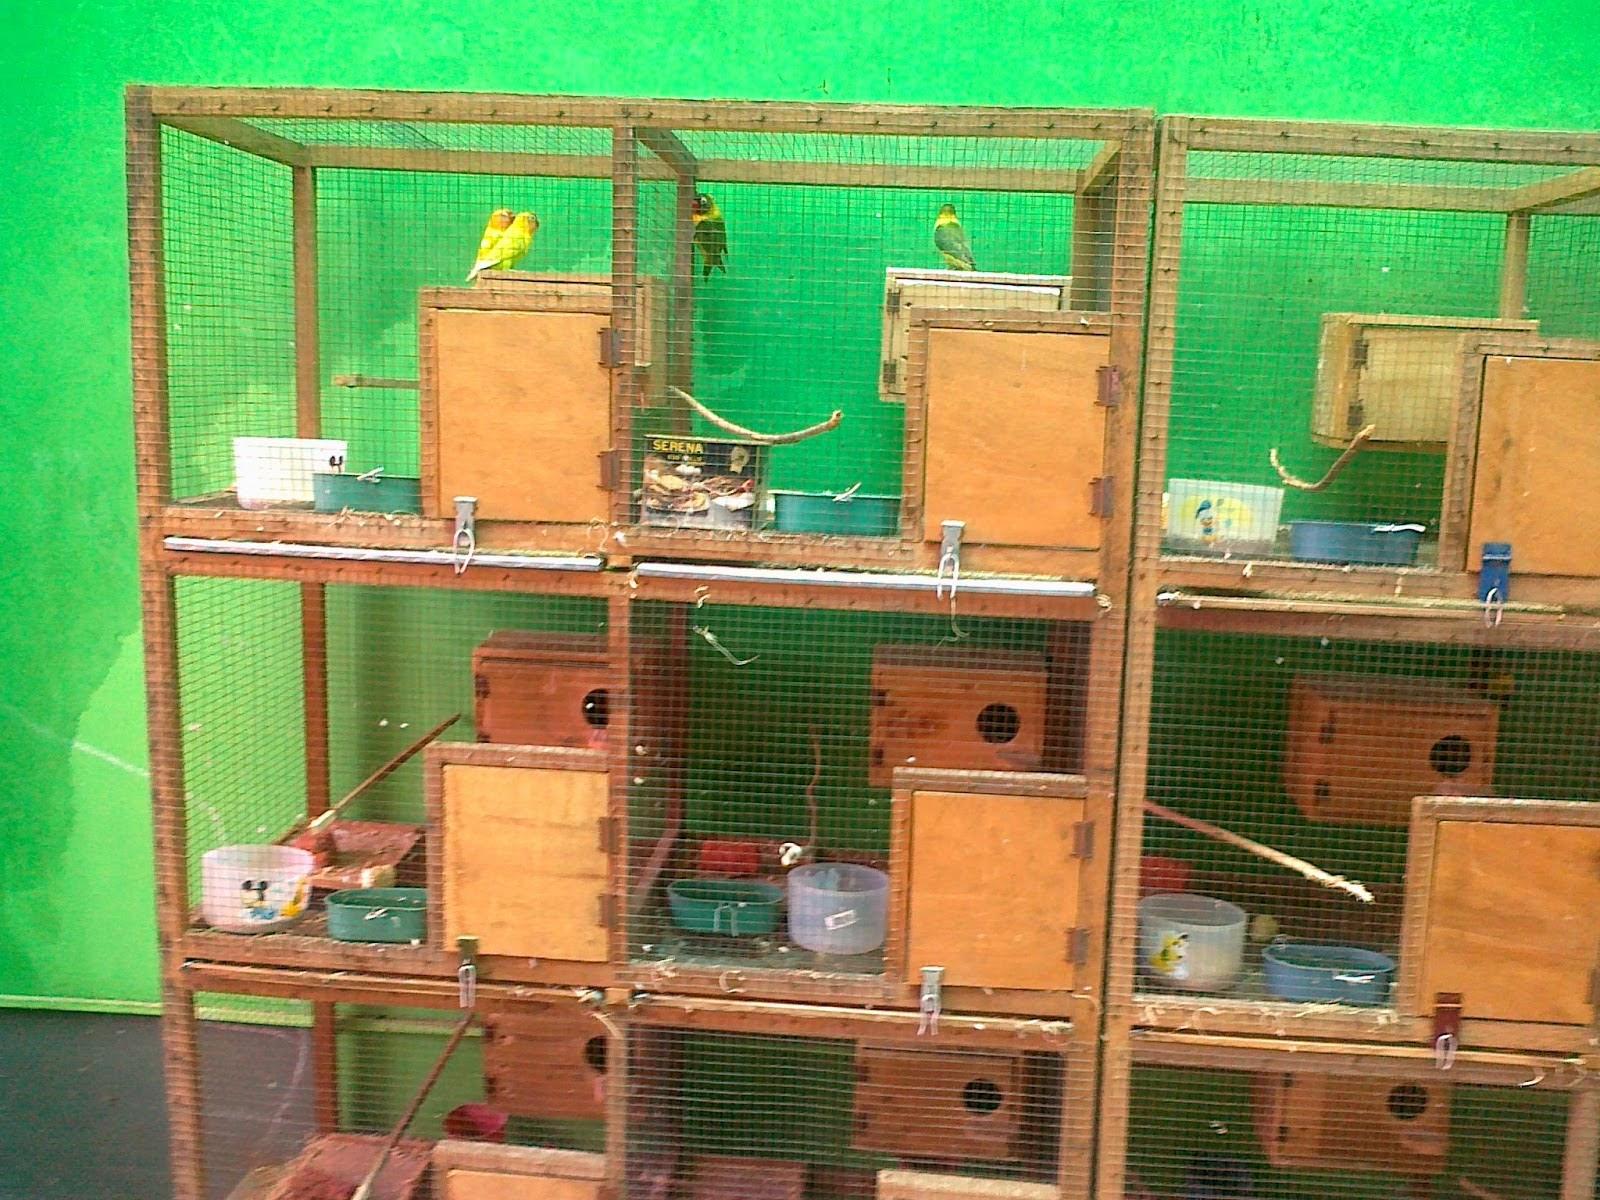 Usaha Sampingan Dengan Modal Minimal Cara Sukses Usaha Sampingan Ternak Lovebird Modal Kecil